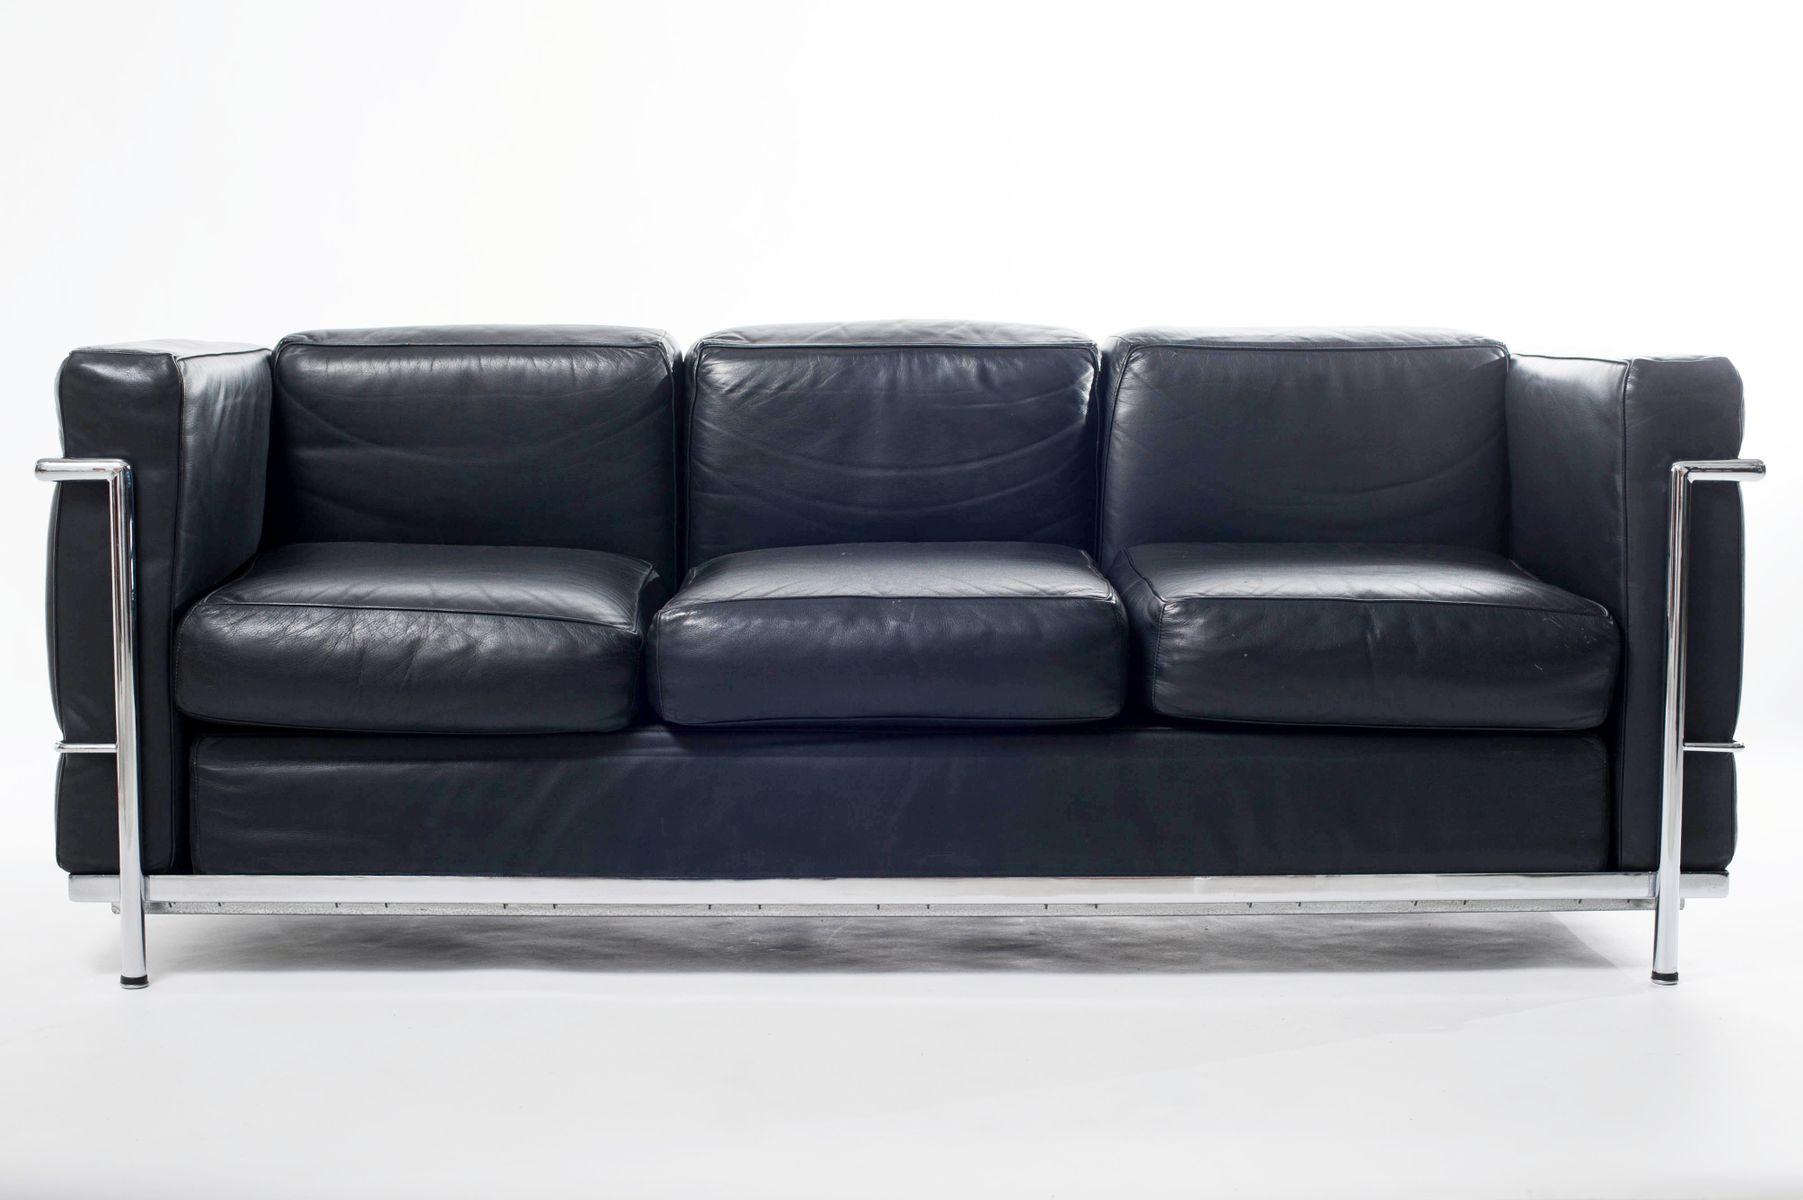 lc3 sofa von le corbusier f r alivar bei pamono kaufen. Black Bedroom Furniture Sets. Home Design Ideas